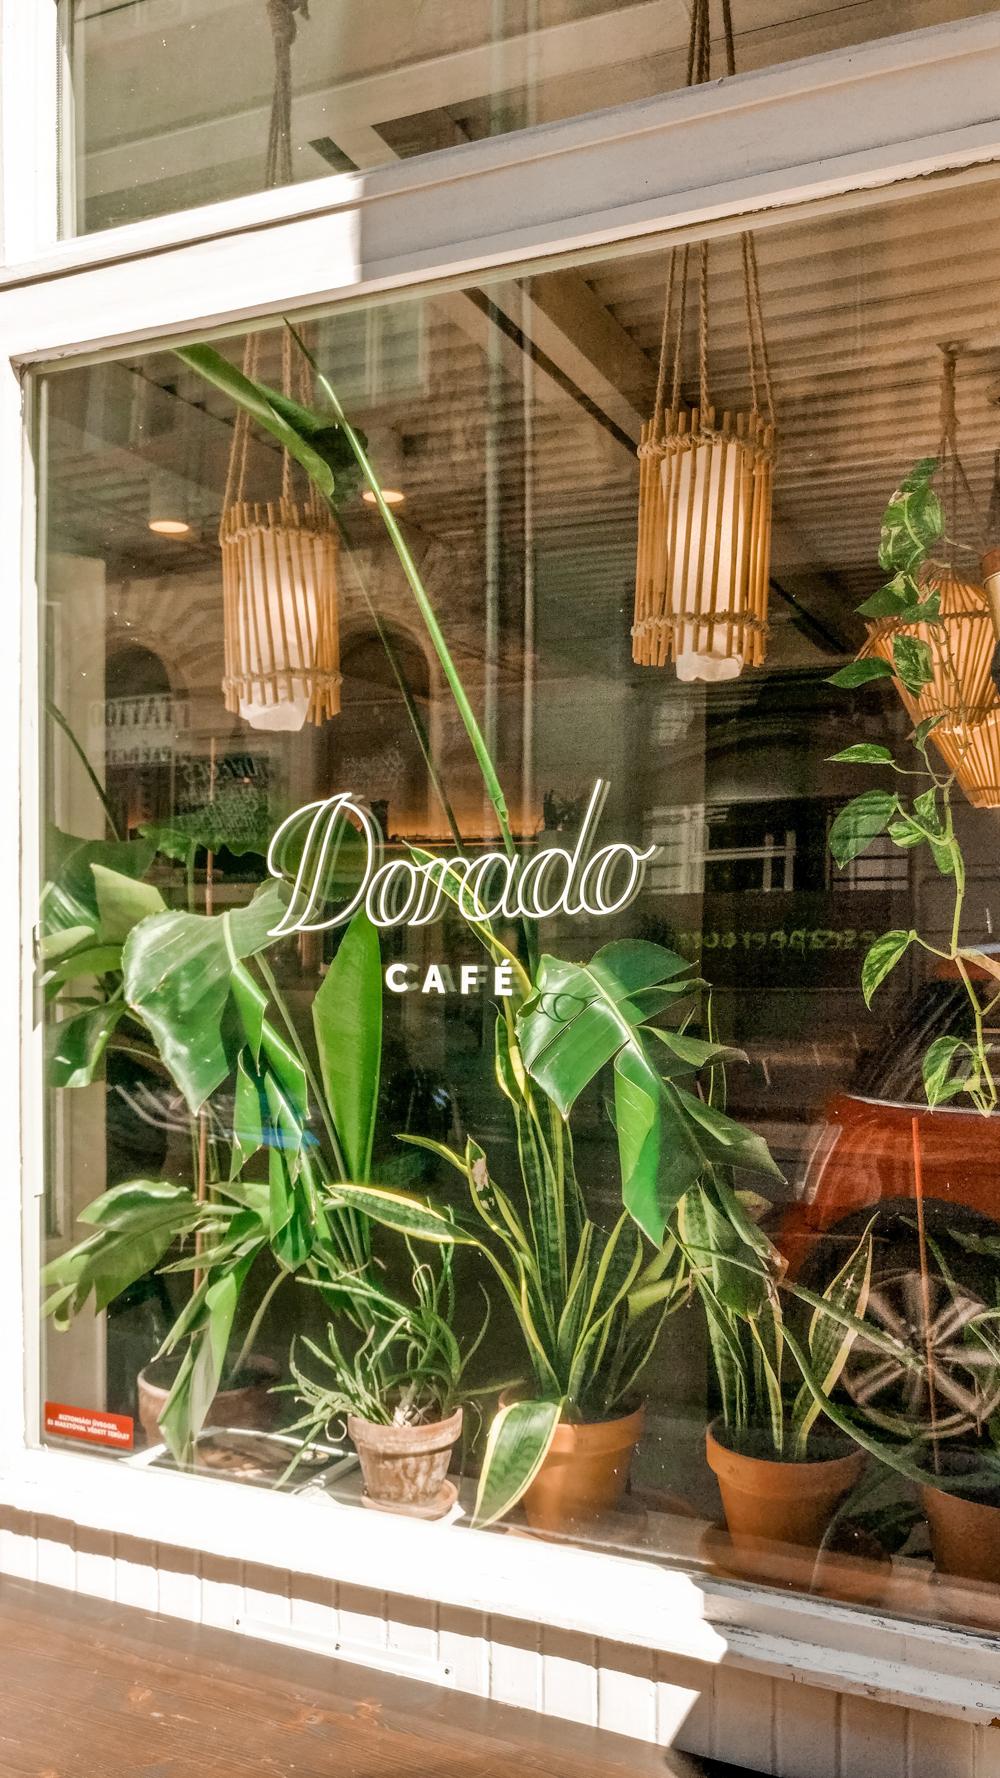 Dorado Café - 10 must-visit stylish specialty coffee shops in Budapest, Hungary   Aliz's Wonderland